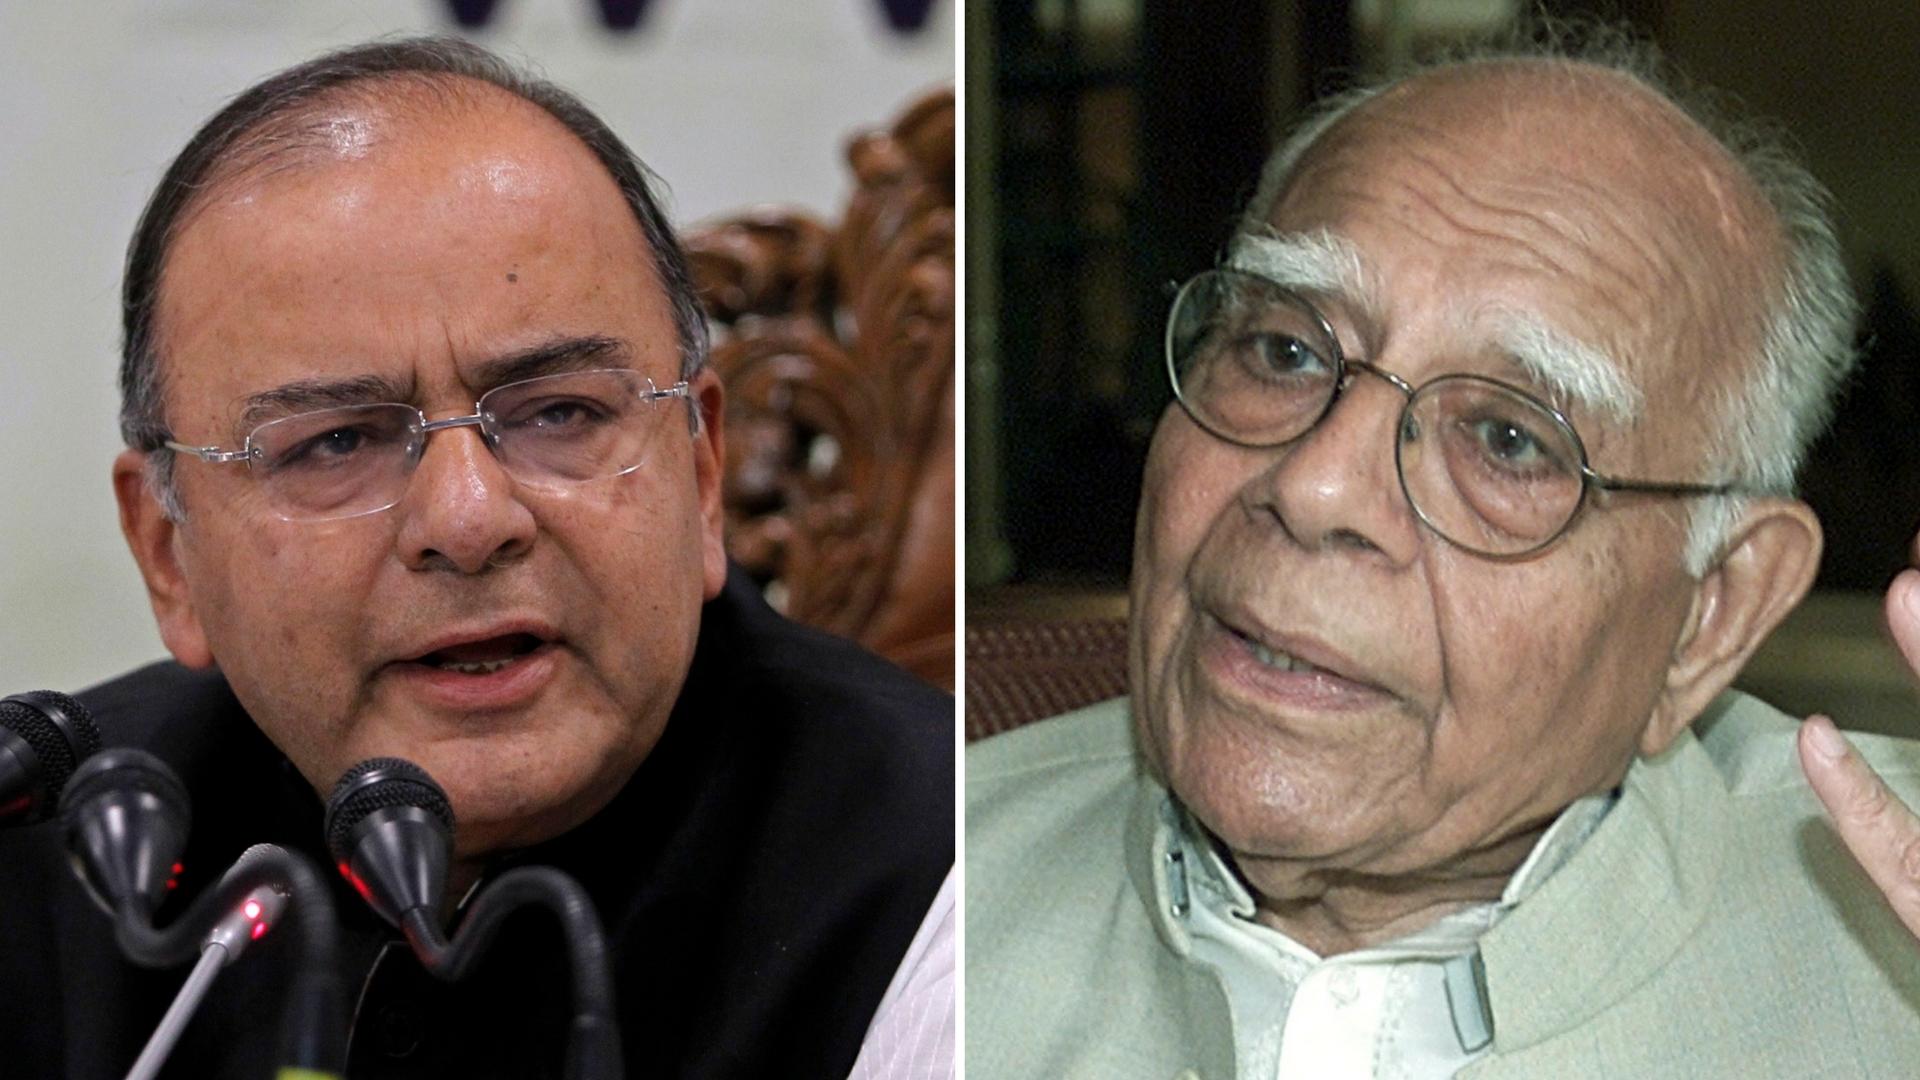 Bypolls to Rajya Sabha Seats Held by Jaitley, Jethmalani on 16 Oct